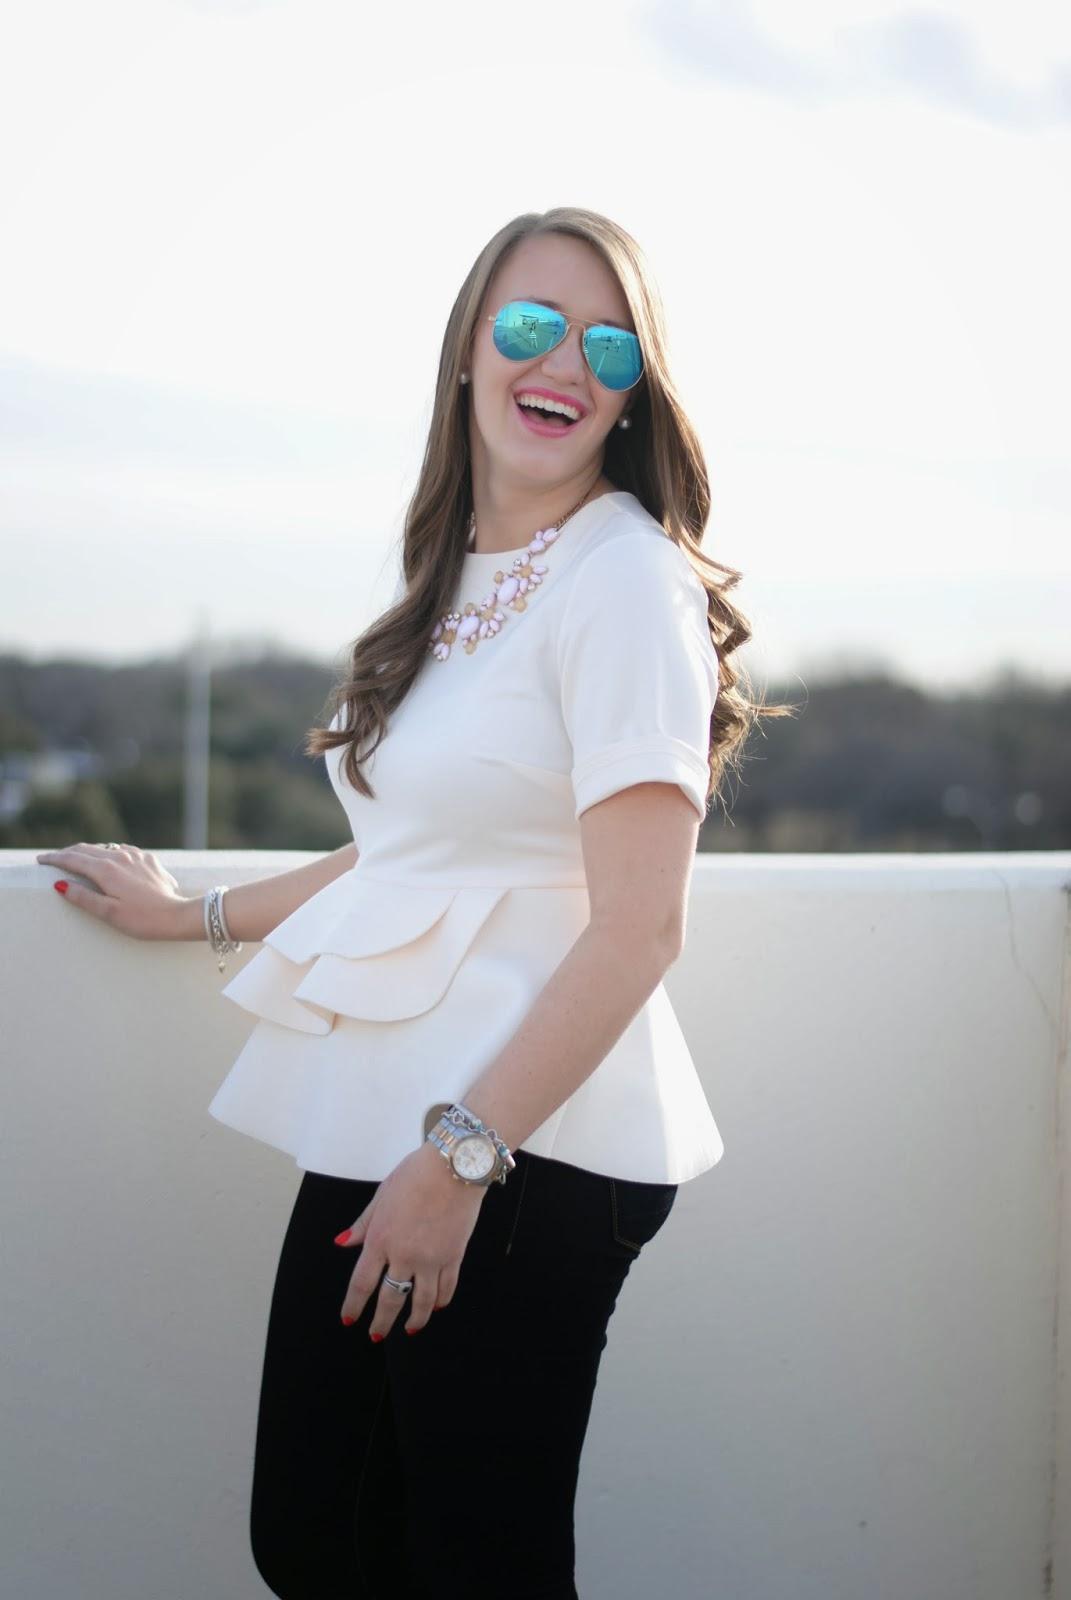 krista robertson, southern shopaholic, fashion blogger, preppy fashion blogger, new york city fashion blogger